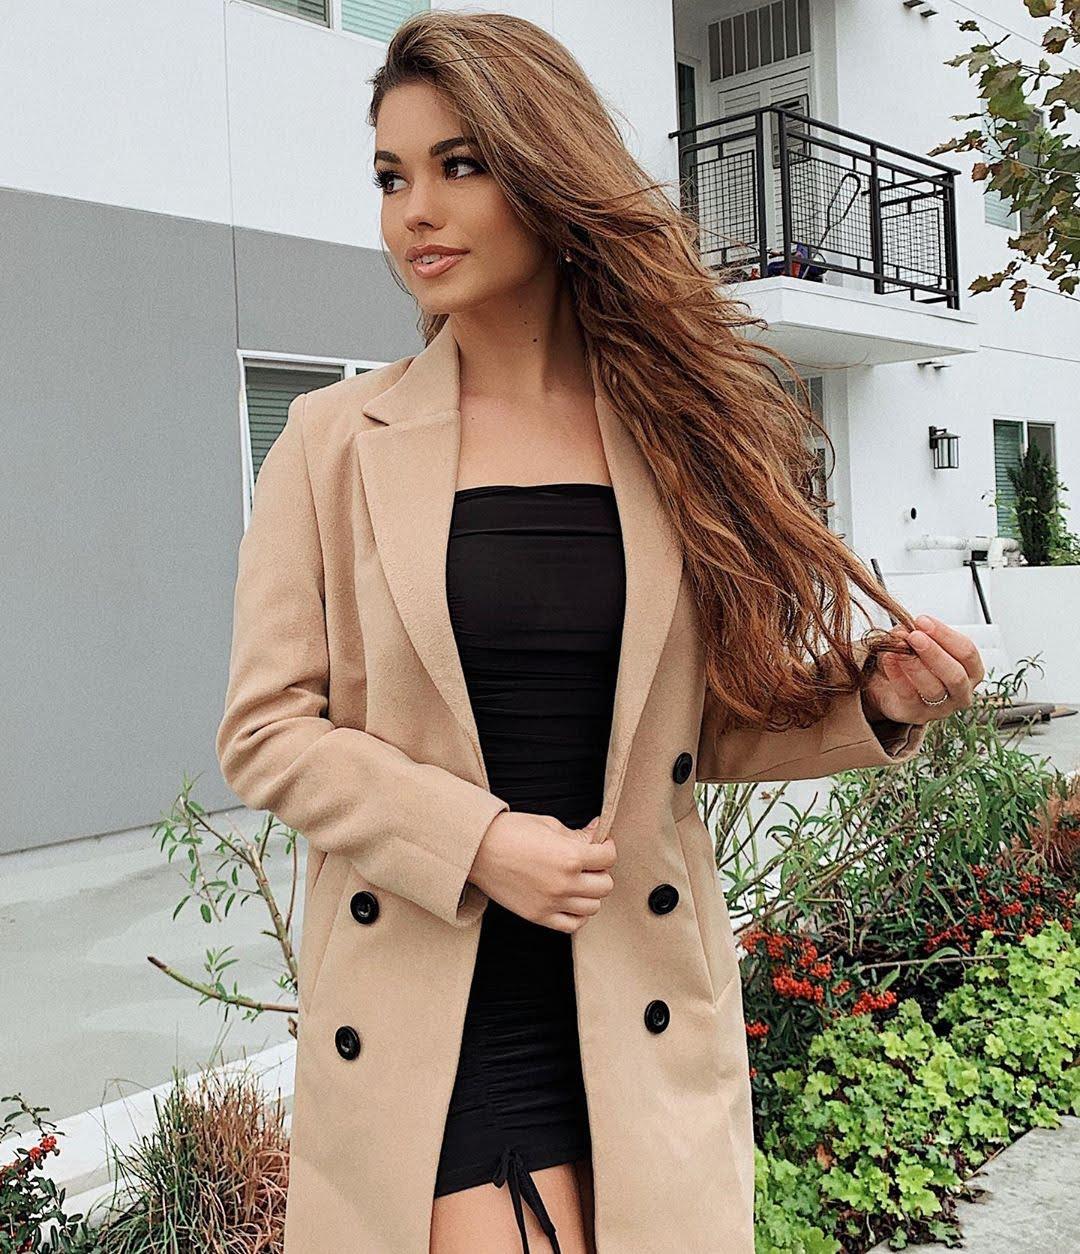 Ariel Yasmine 10